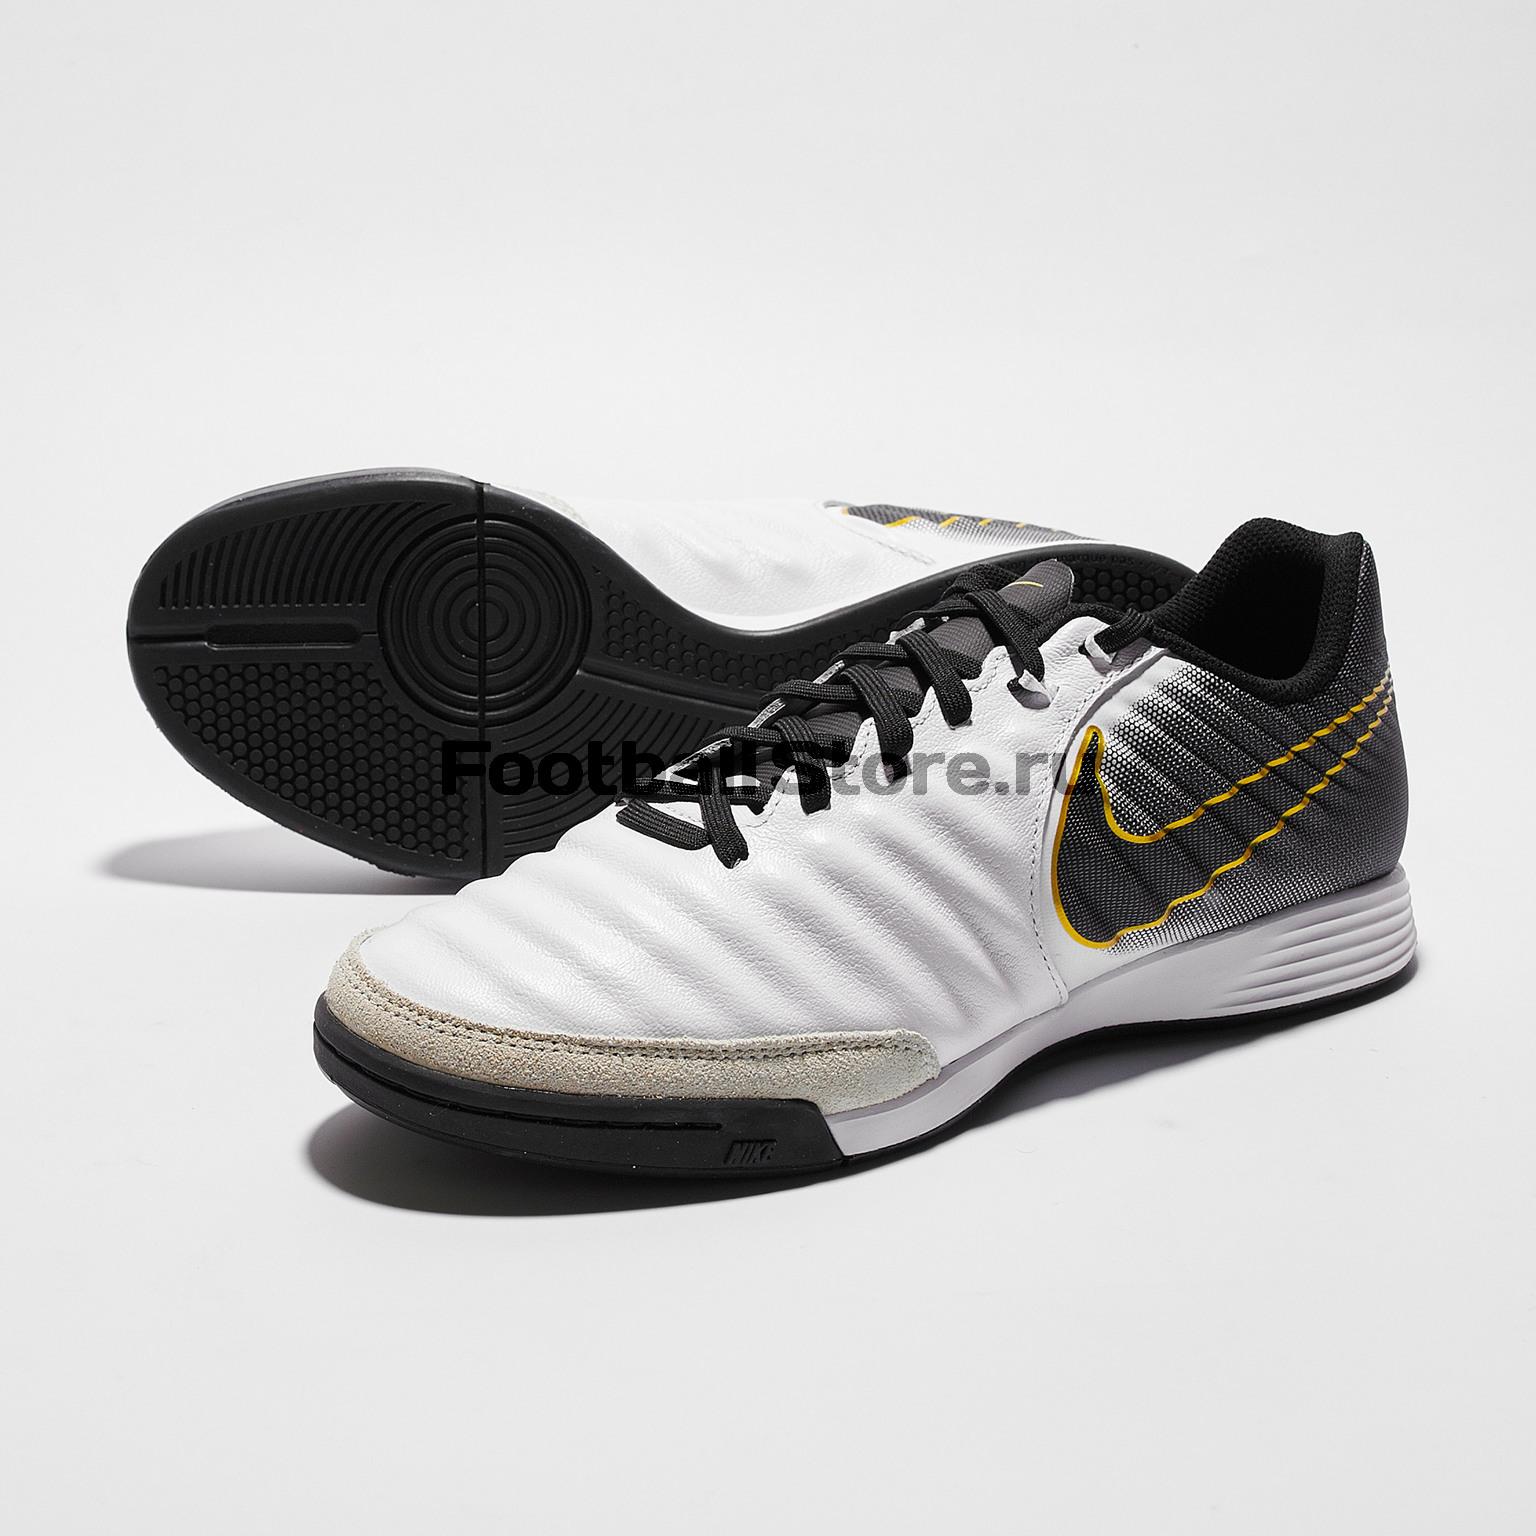 Обувь для зала Nike LegendX 7 Academy IC AH7244-100 обувь для зала nike jr mercurialx proximo 2 cr7 ic 852499 401